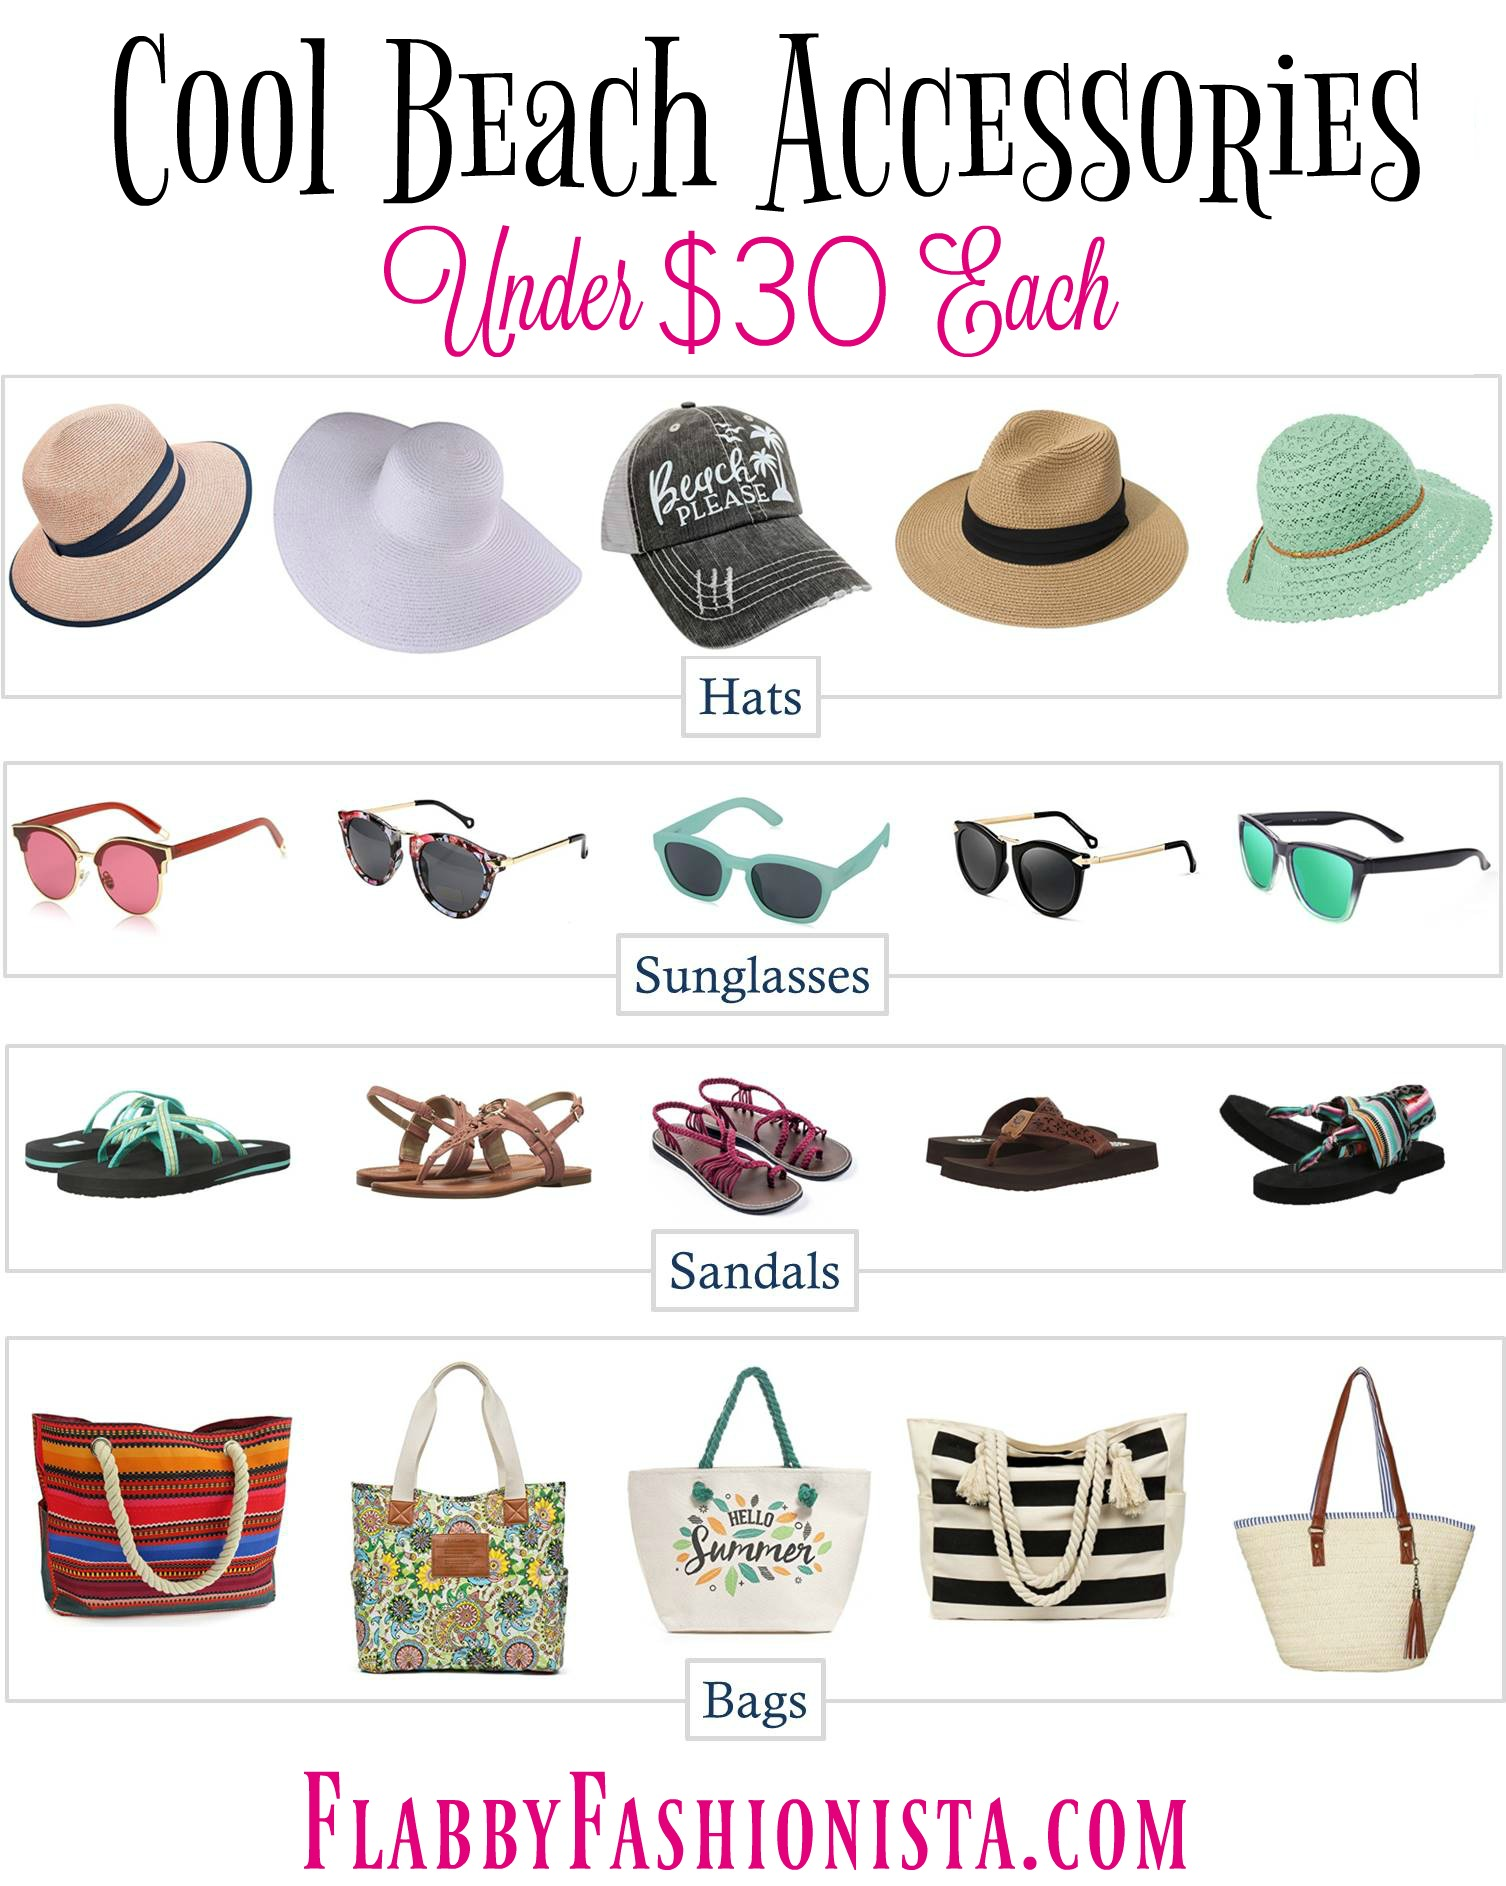 Cool Beach Accessories Under $30 Each